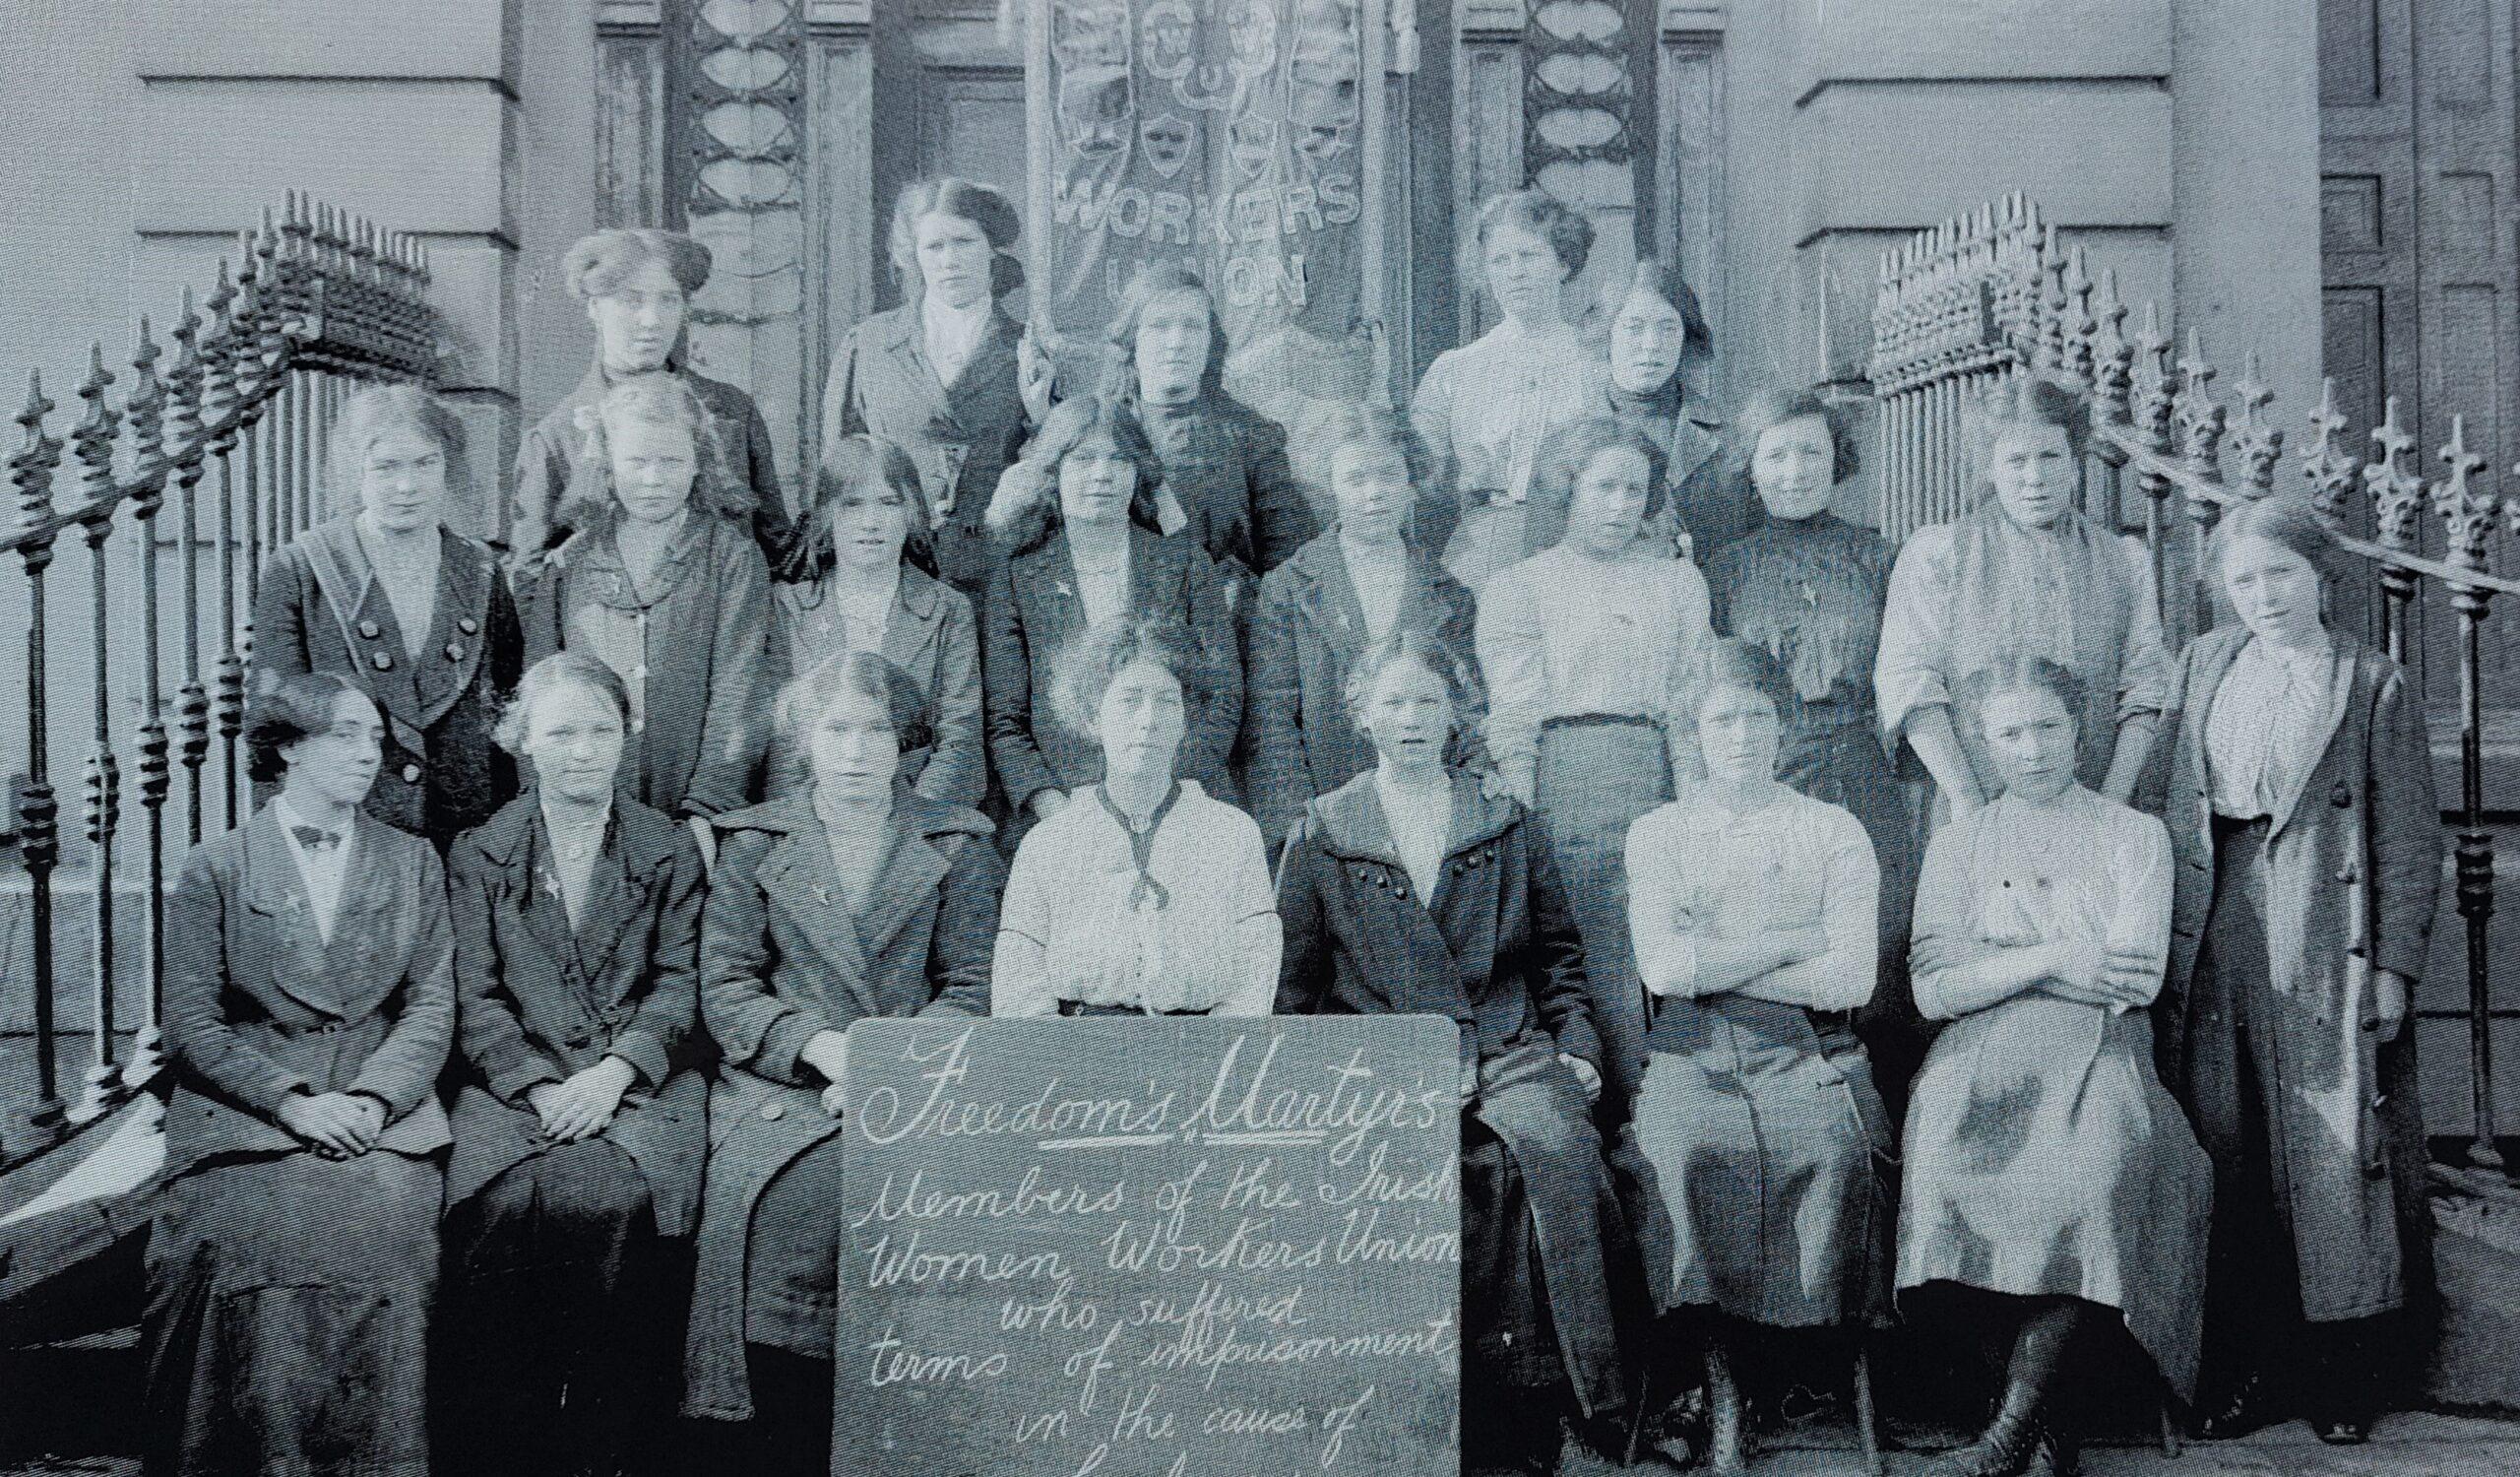 Smashing, striking and rising: some commemorated women